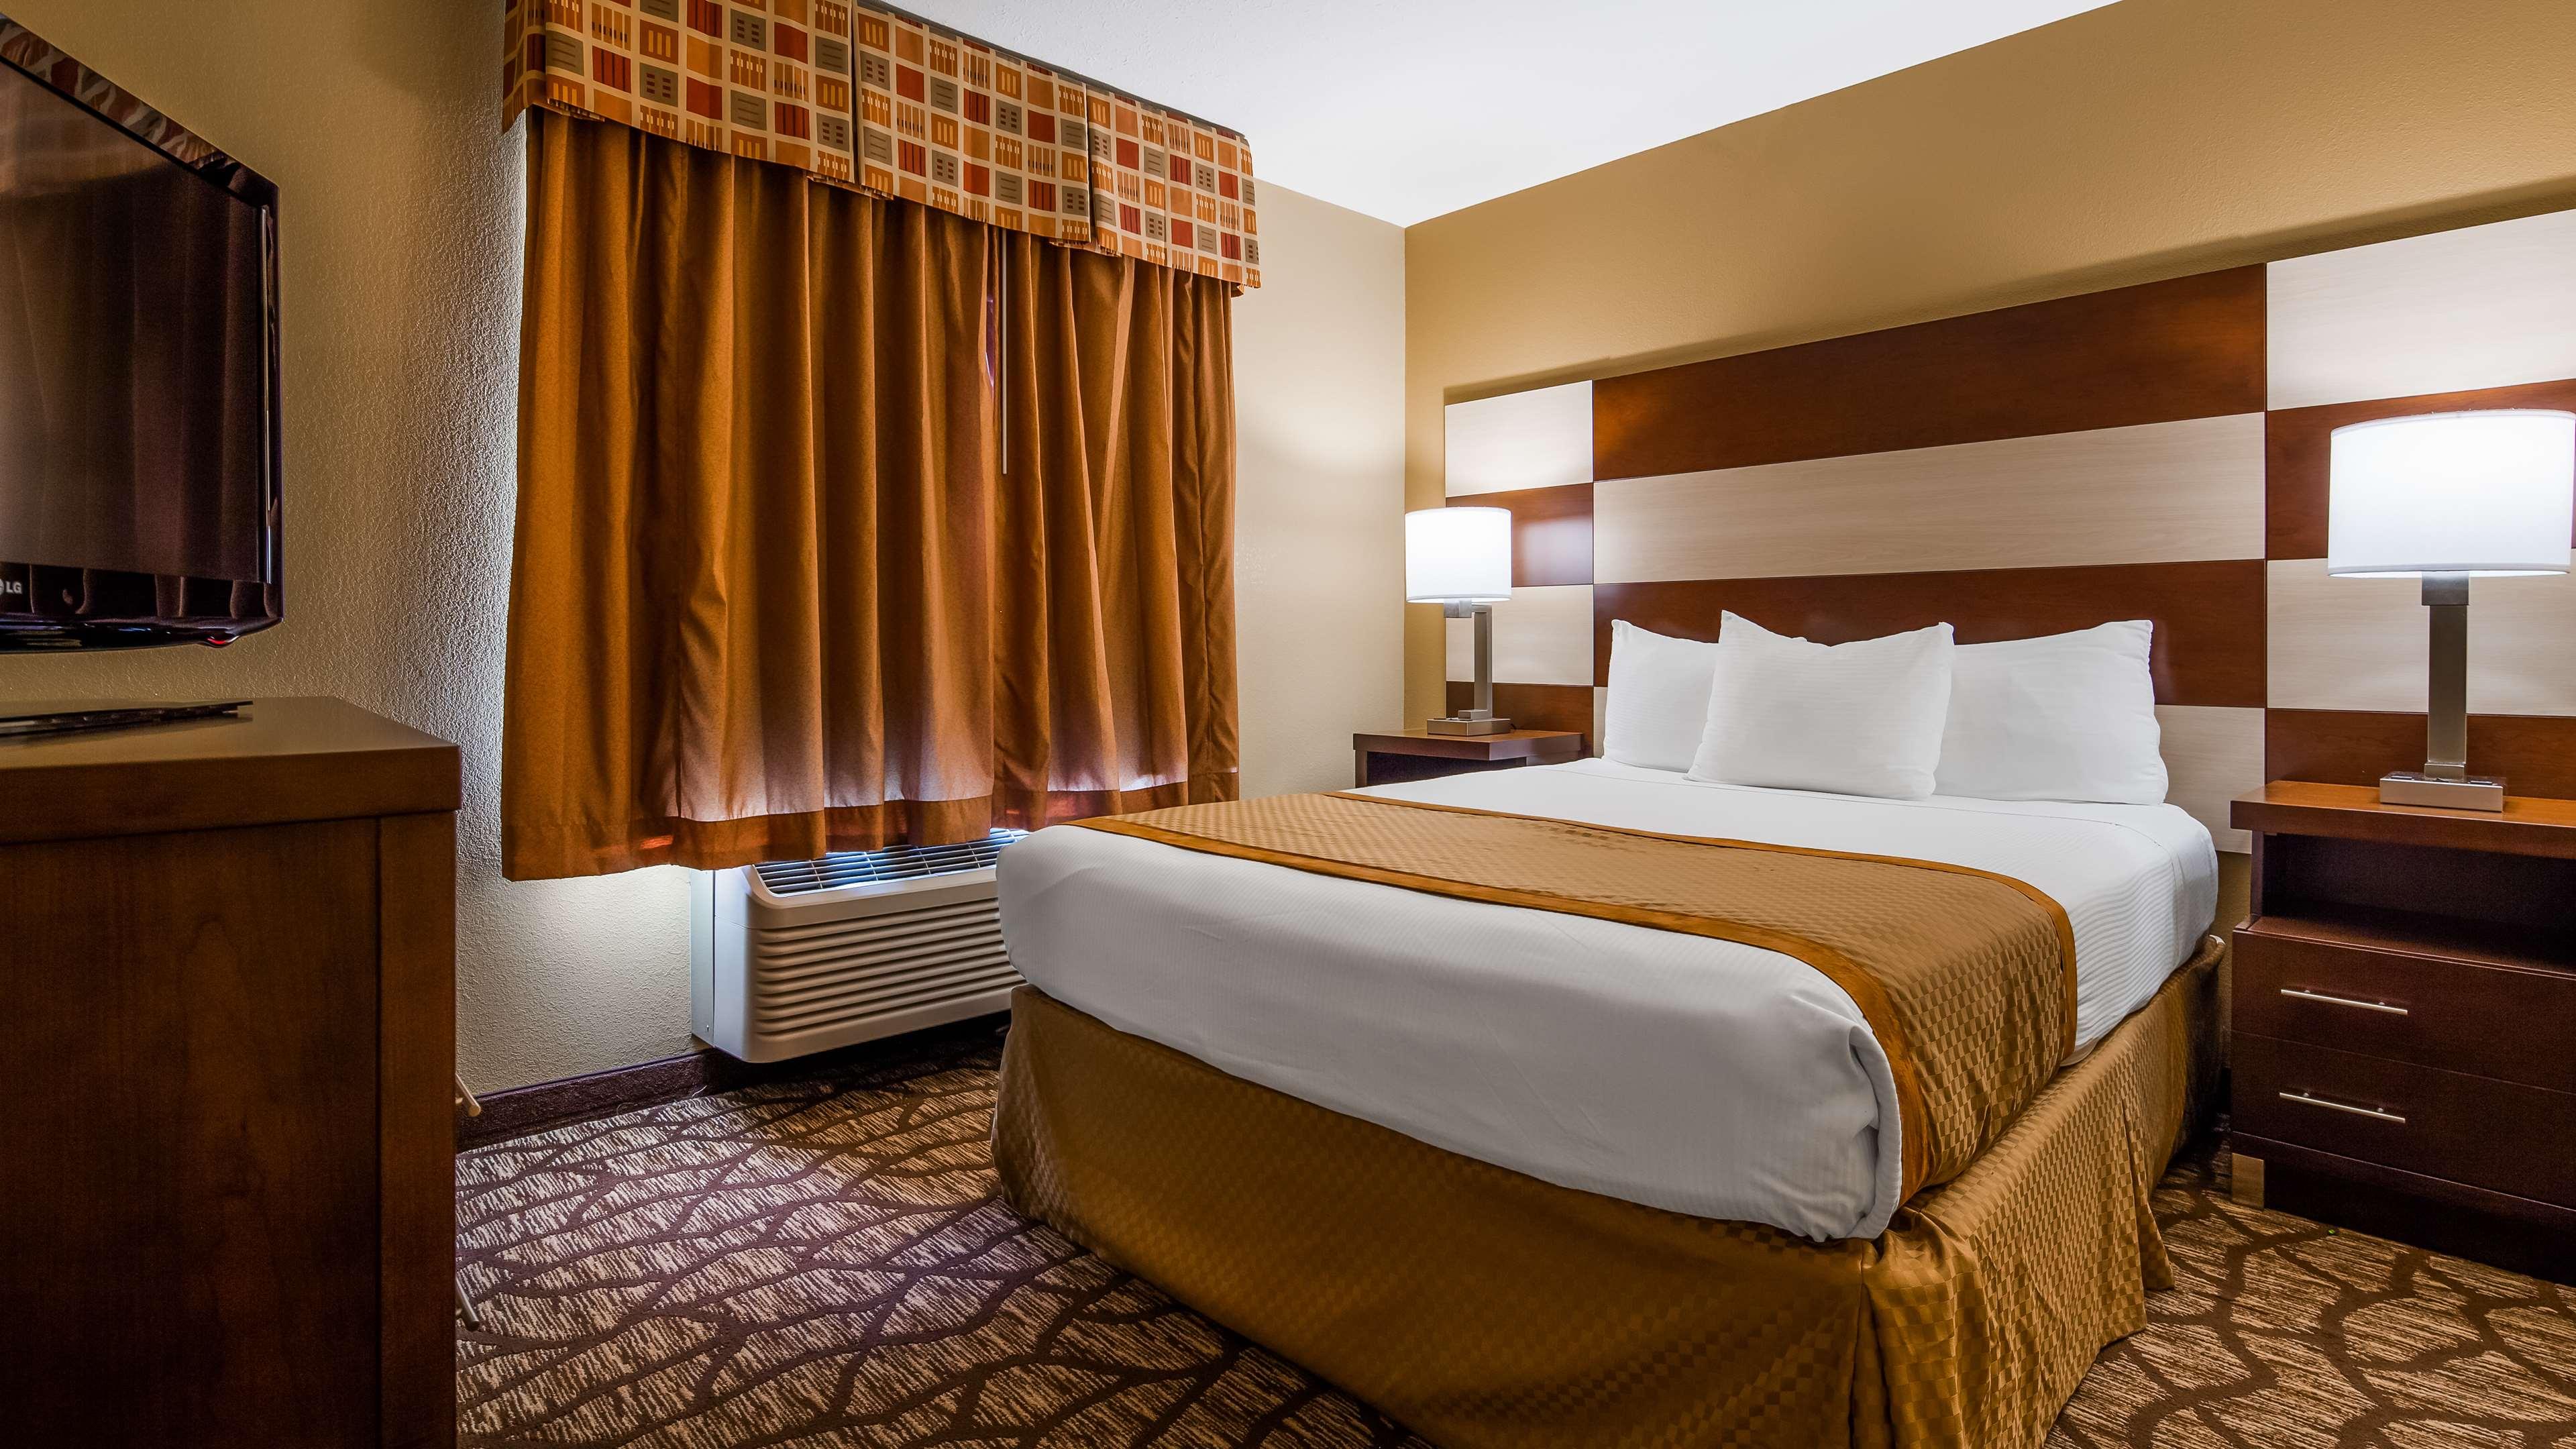 Best Western Joliet Inn & Suites image 15